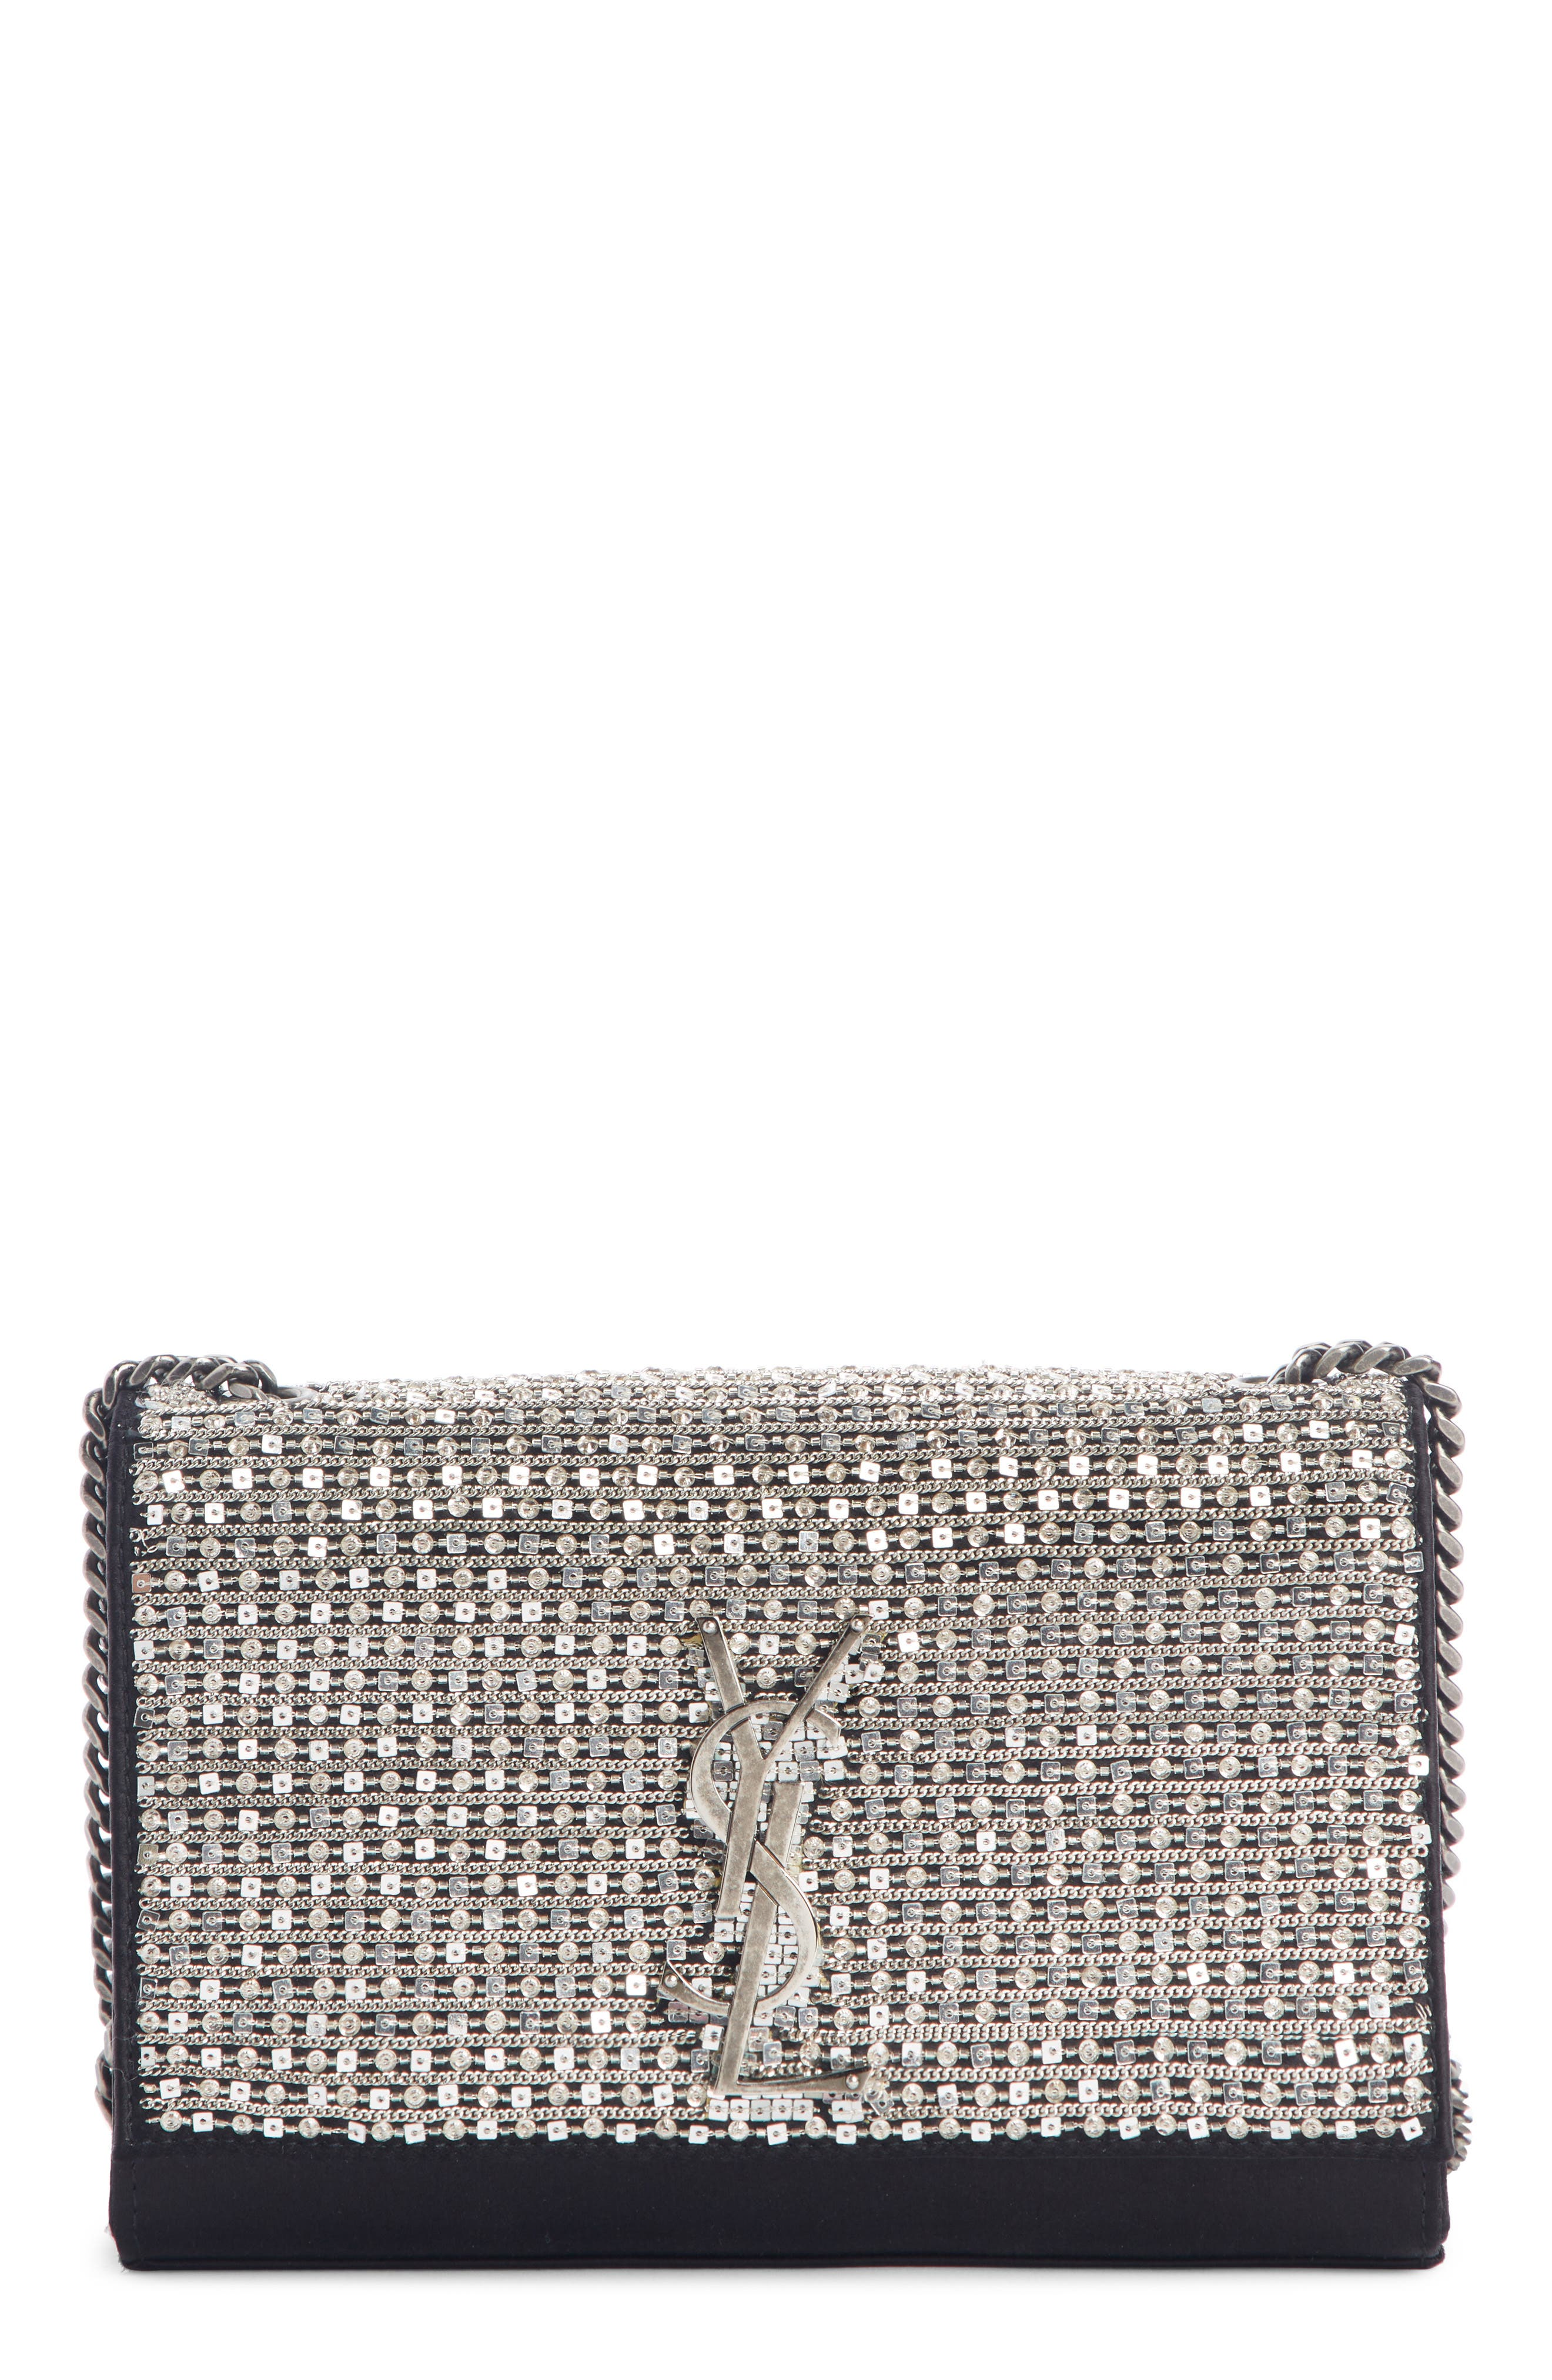 SAINT LAURENT Small Kate Paillettes Satin Crossbody Bag, Main, color, AGED SILVER/ NERO